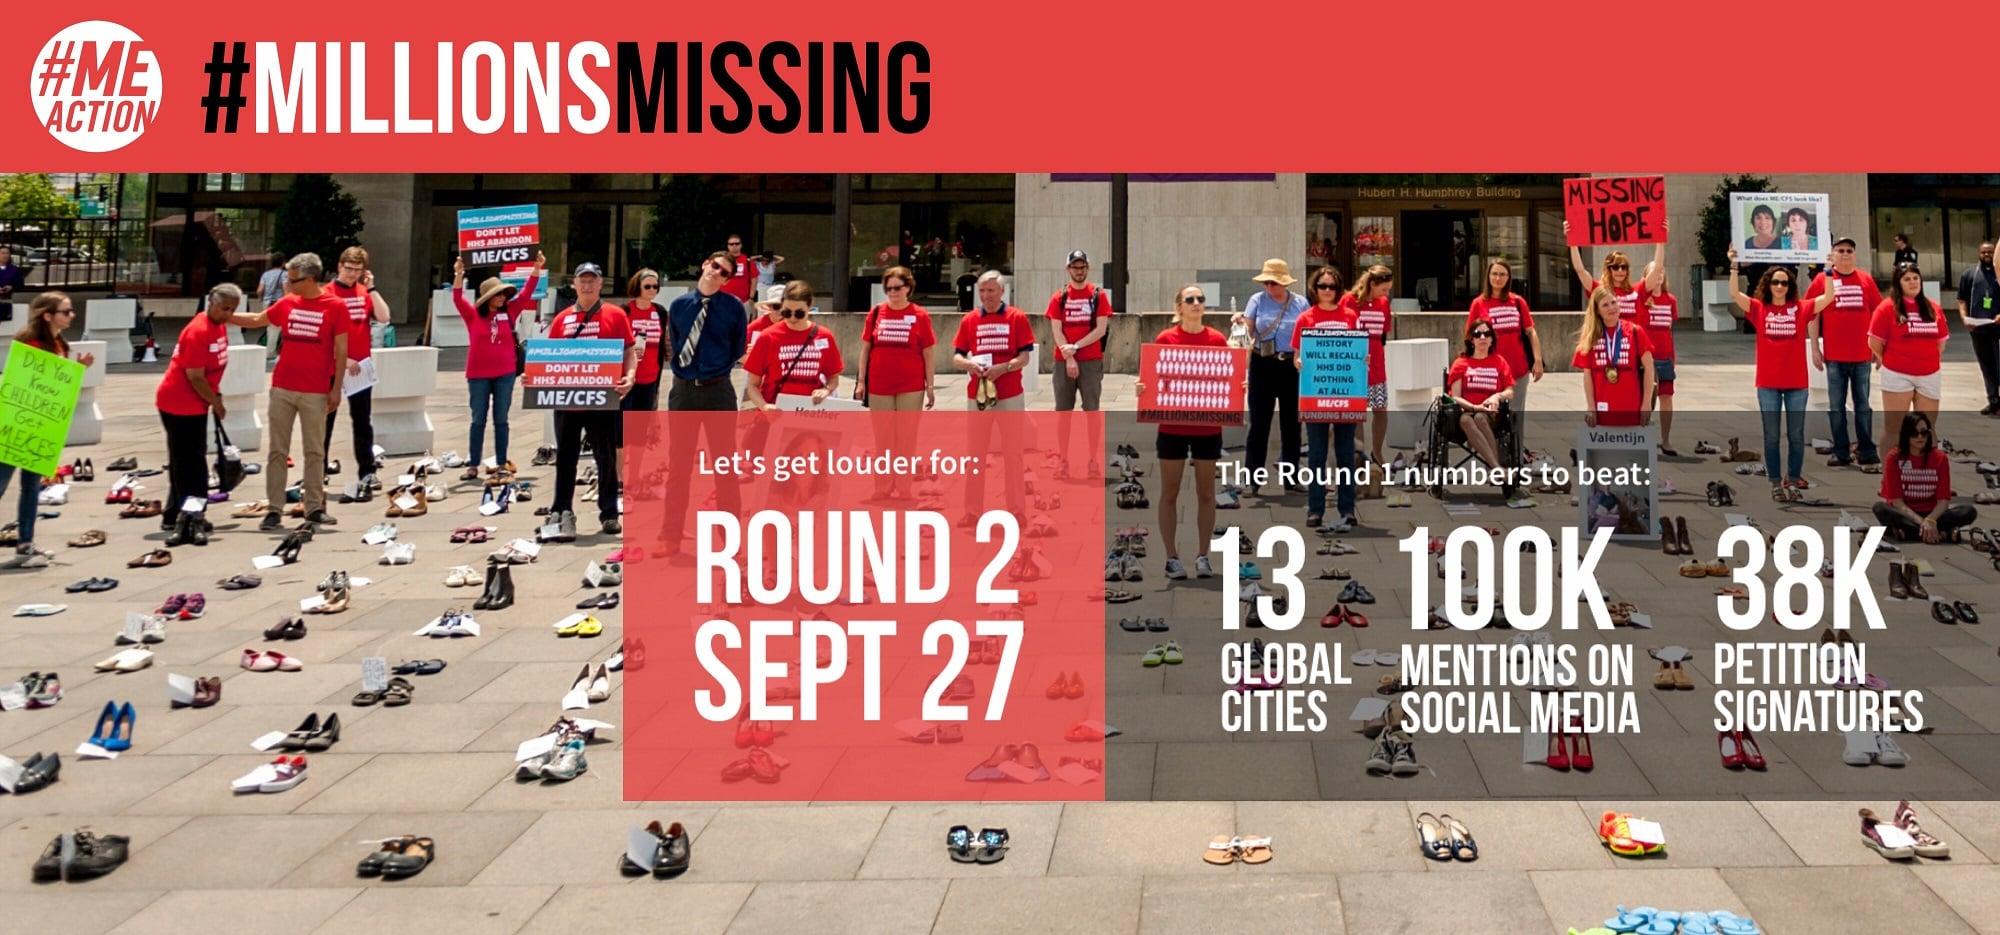 millions-missing-2